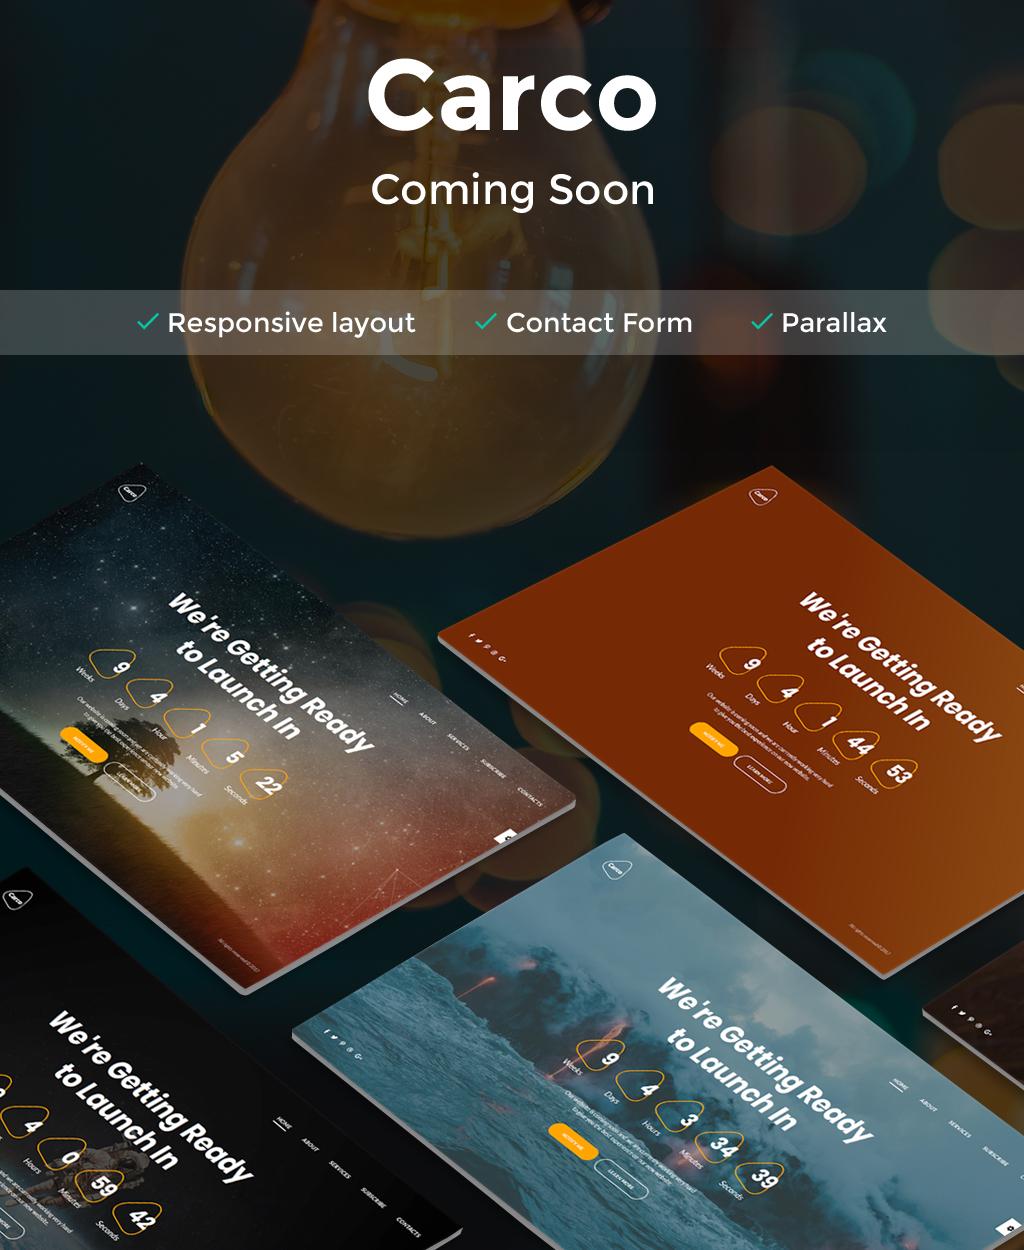 Carco - Coming Soon HTML5 Páginas Especiais №64894